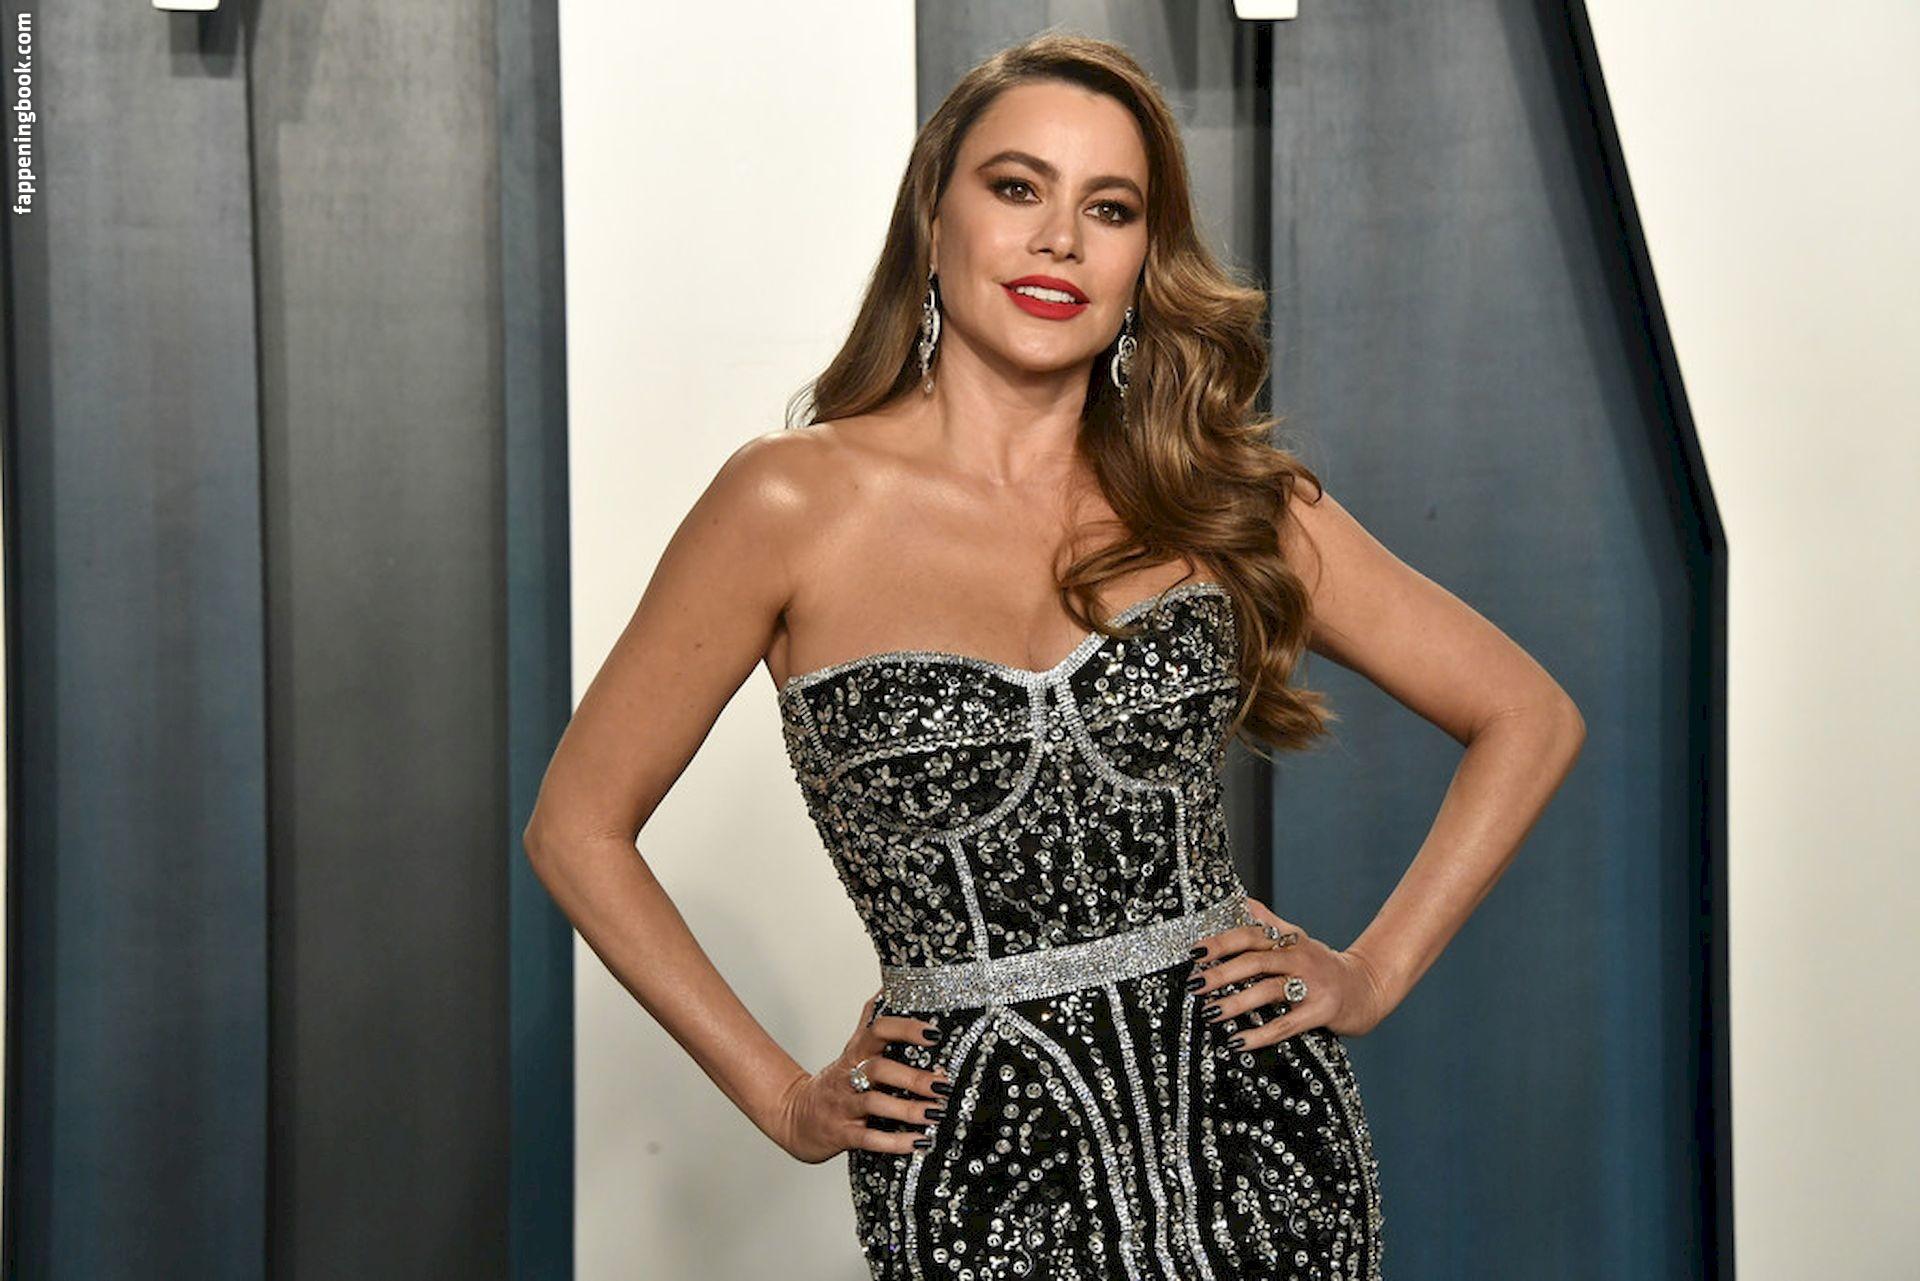 Superstar Sofia Vergara Naked Leaked Images